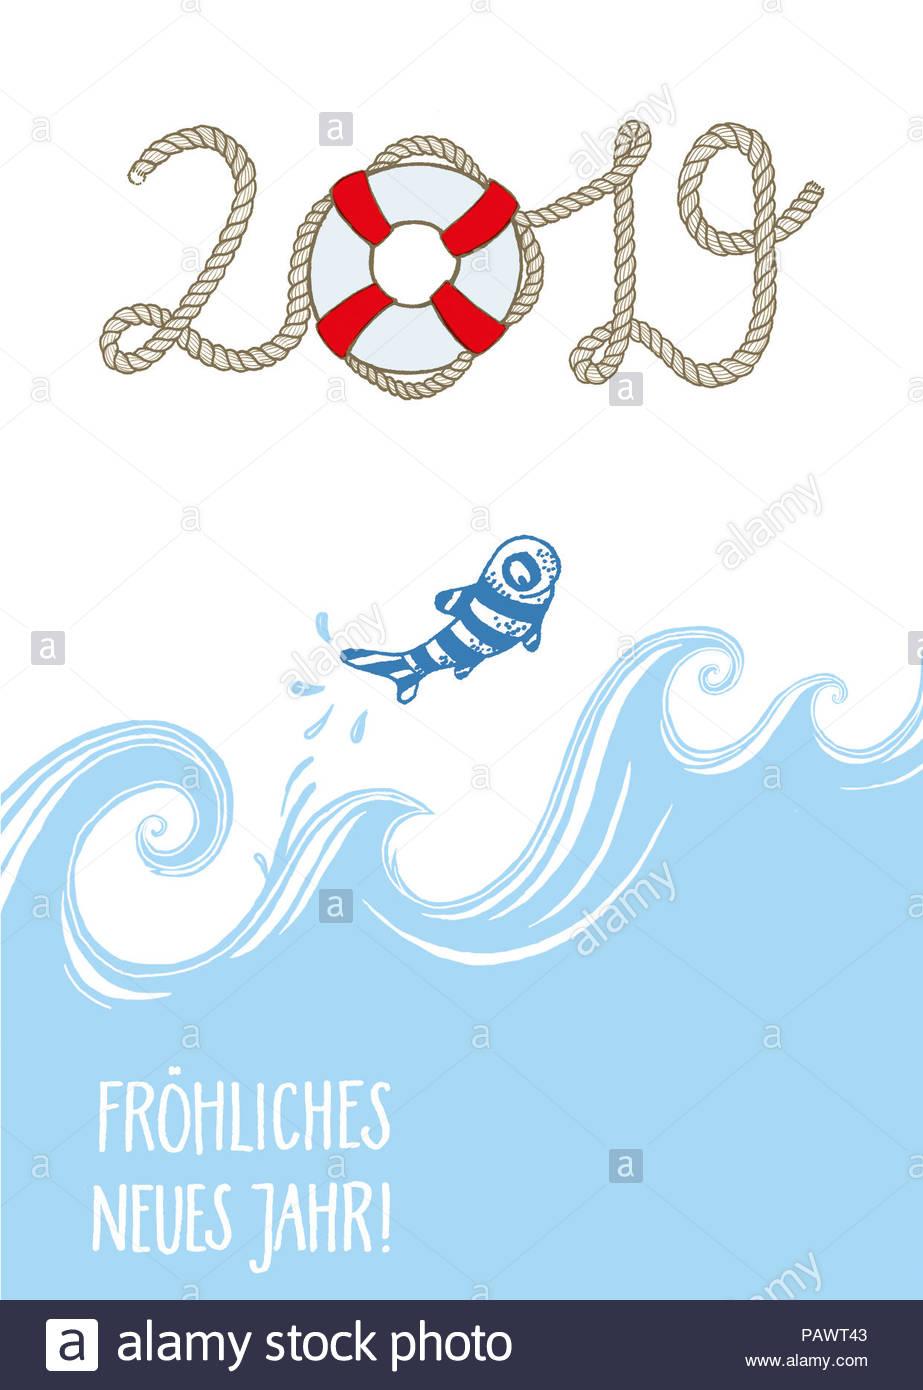 Fish 2019 series greeting cards stock photo 213238707 alamy fish 2019 series greeting cards m4hsunfo